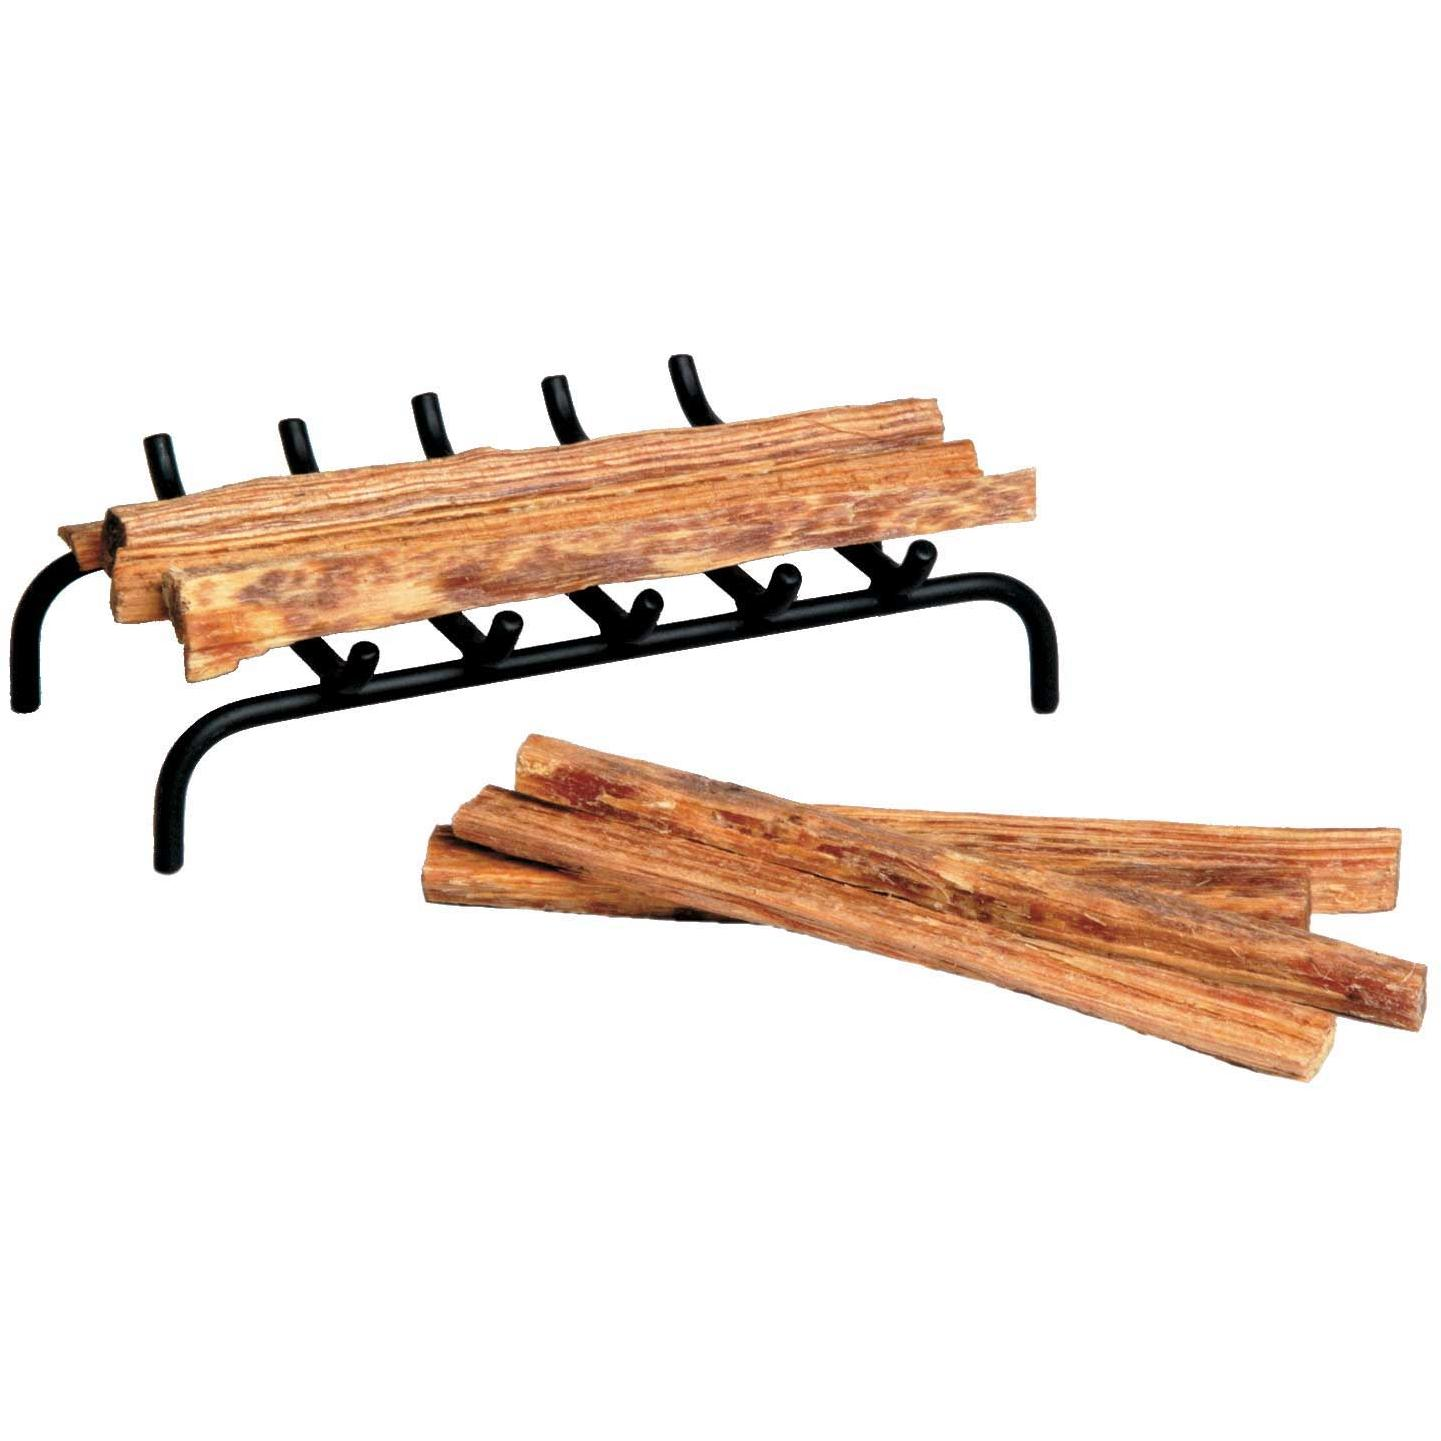 UniFlame Fatwood Firewood Starter Grate